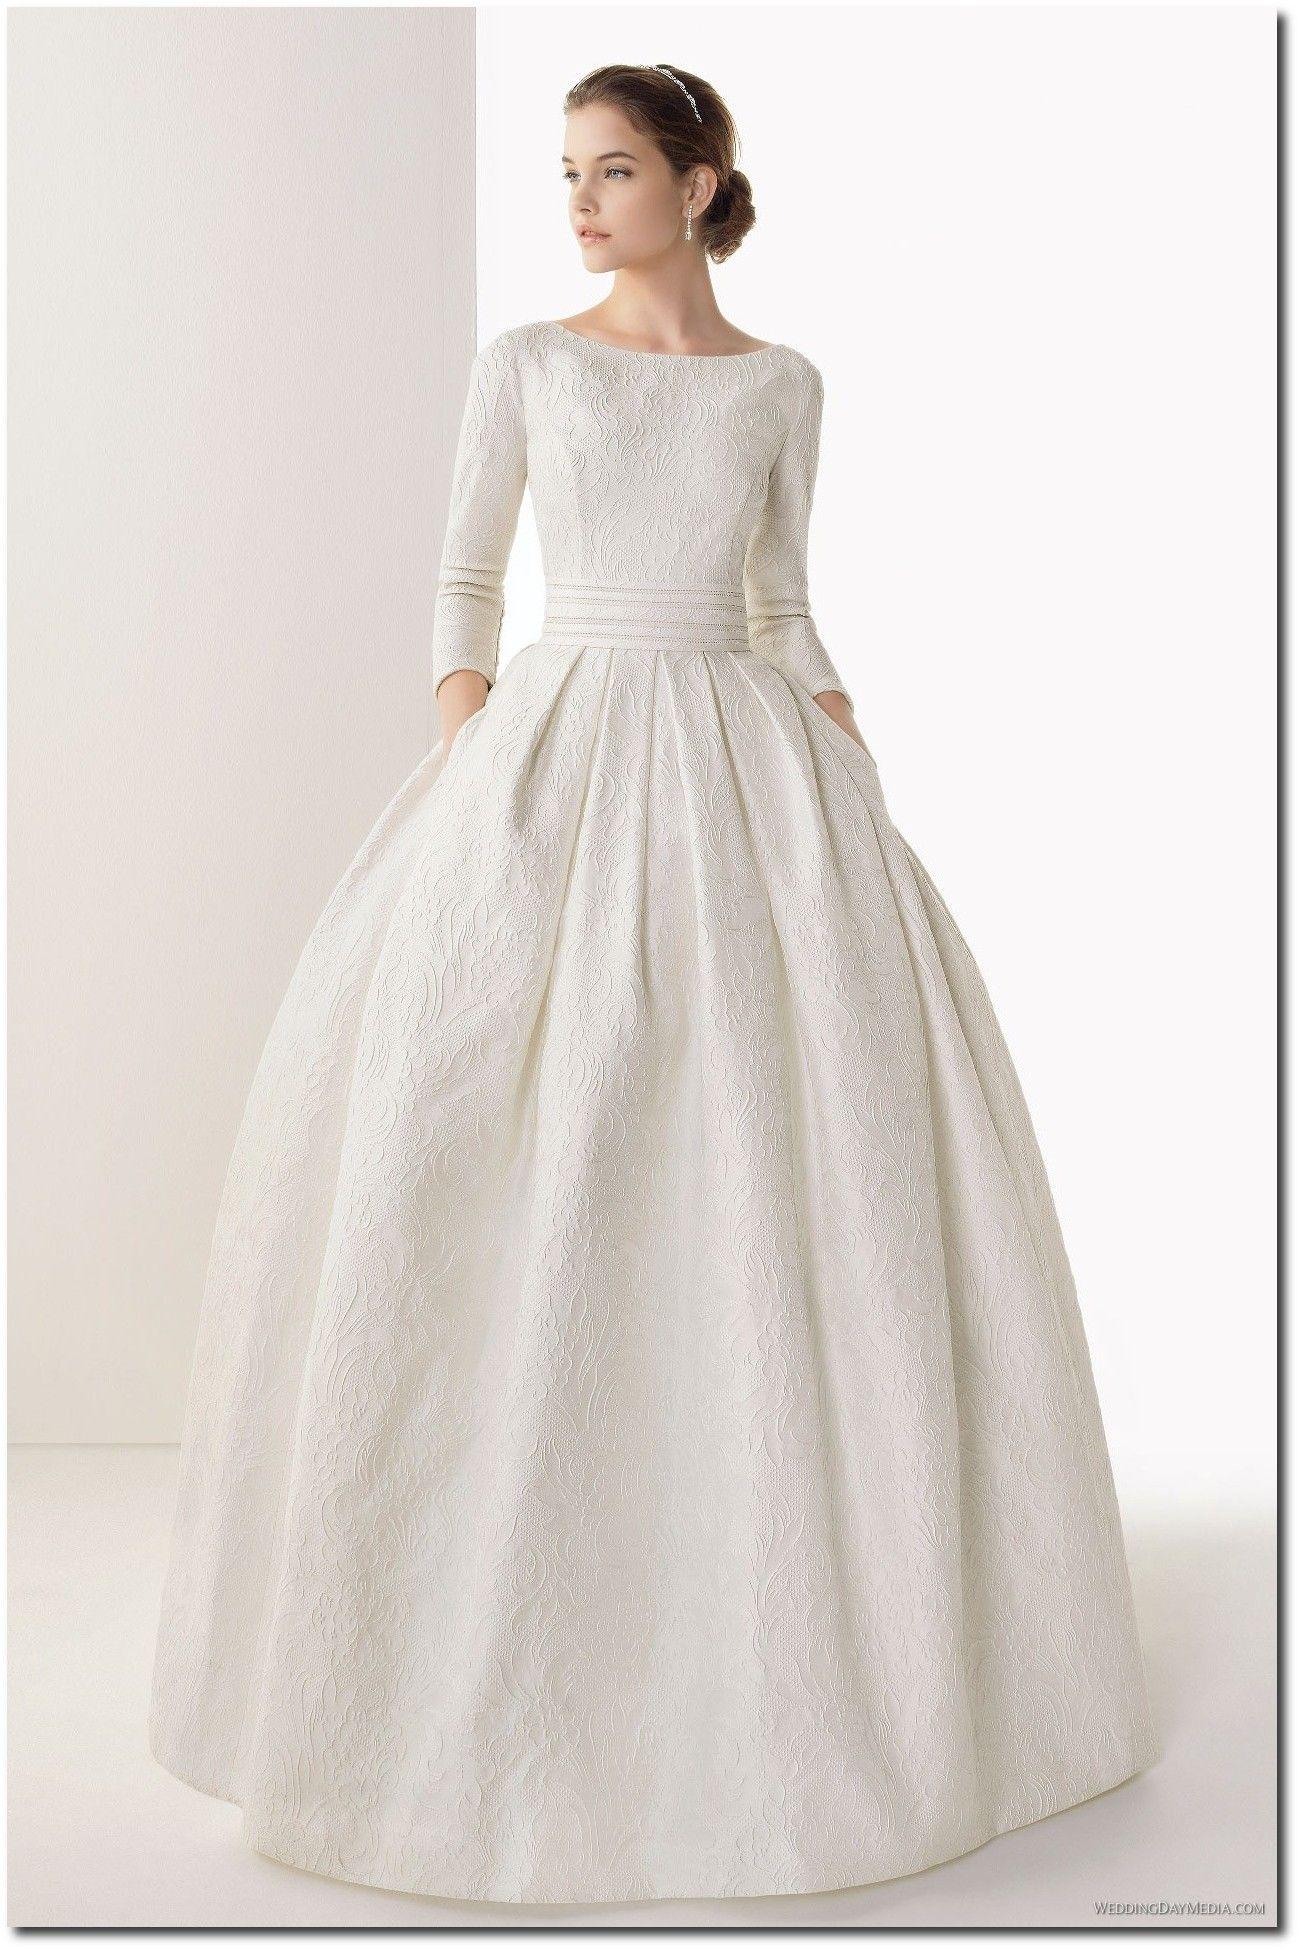 Pin by anda dogar on wedding dresses pinterest wedding dresses